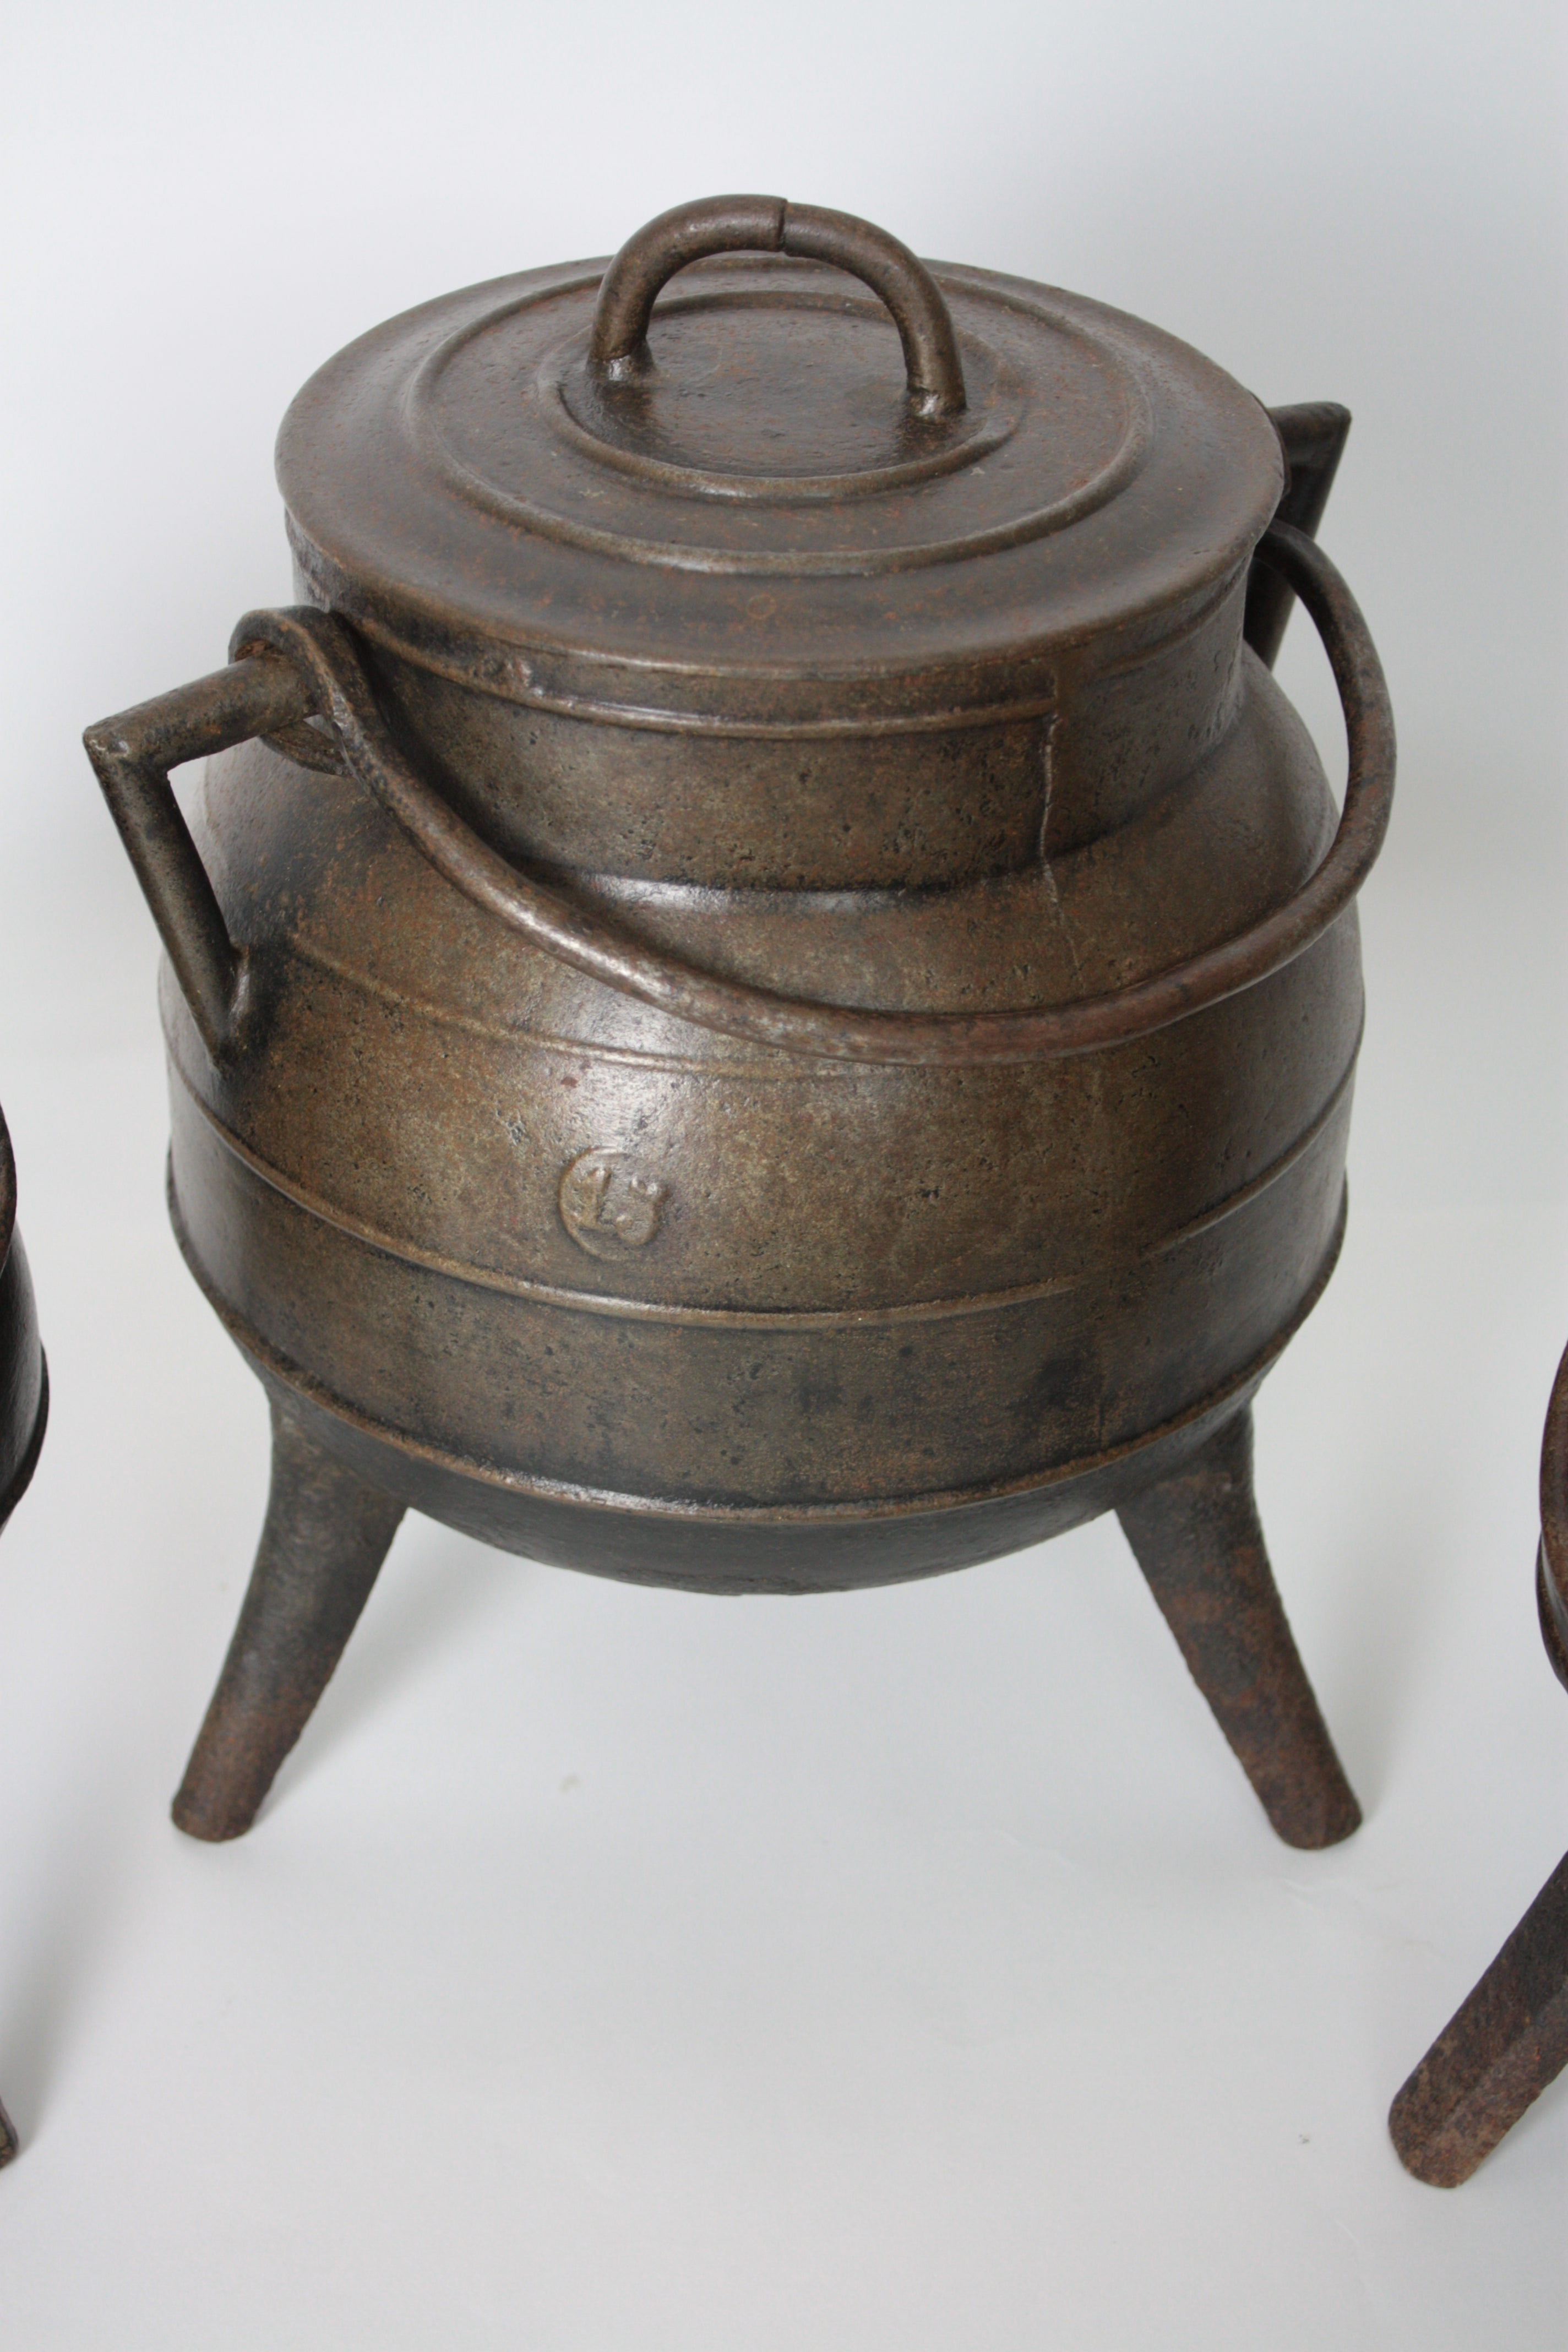 Set of Three Spanish 1930s Cast Iron Kitchen Pots or Cauldrons